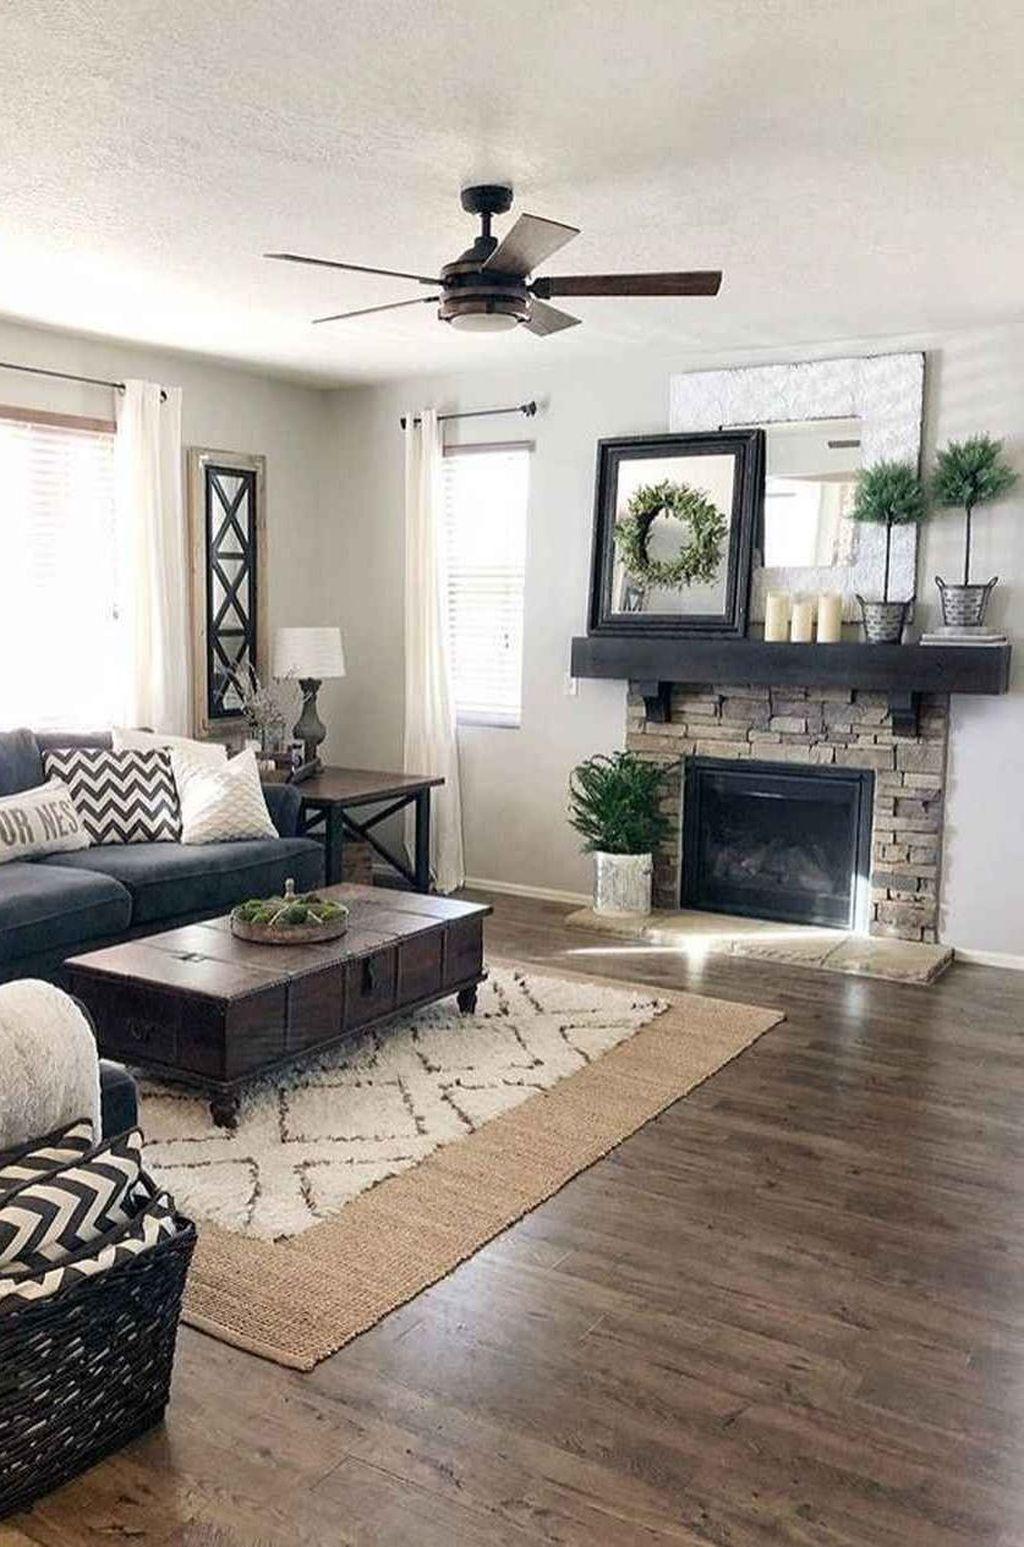 31 popular farmhouse interior design ideas that will make on gorgeous modern farmhouse entryway decorating ideas produce a right one id=96650